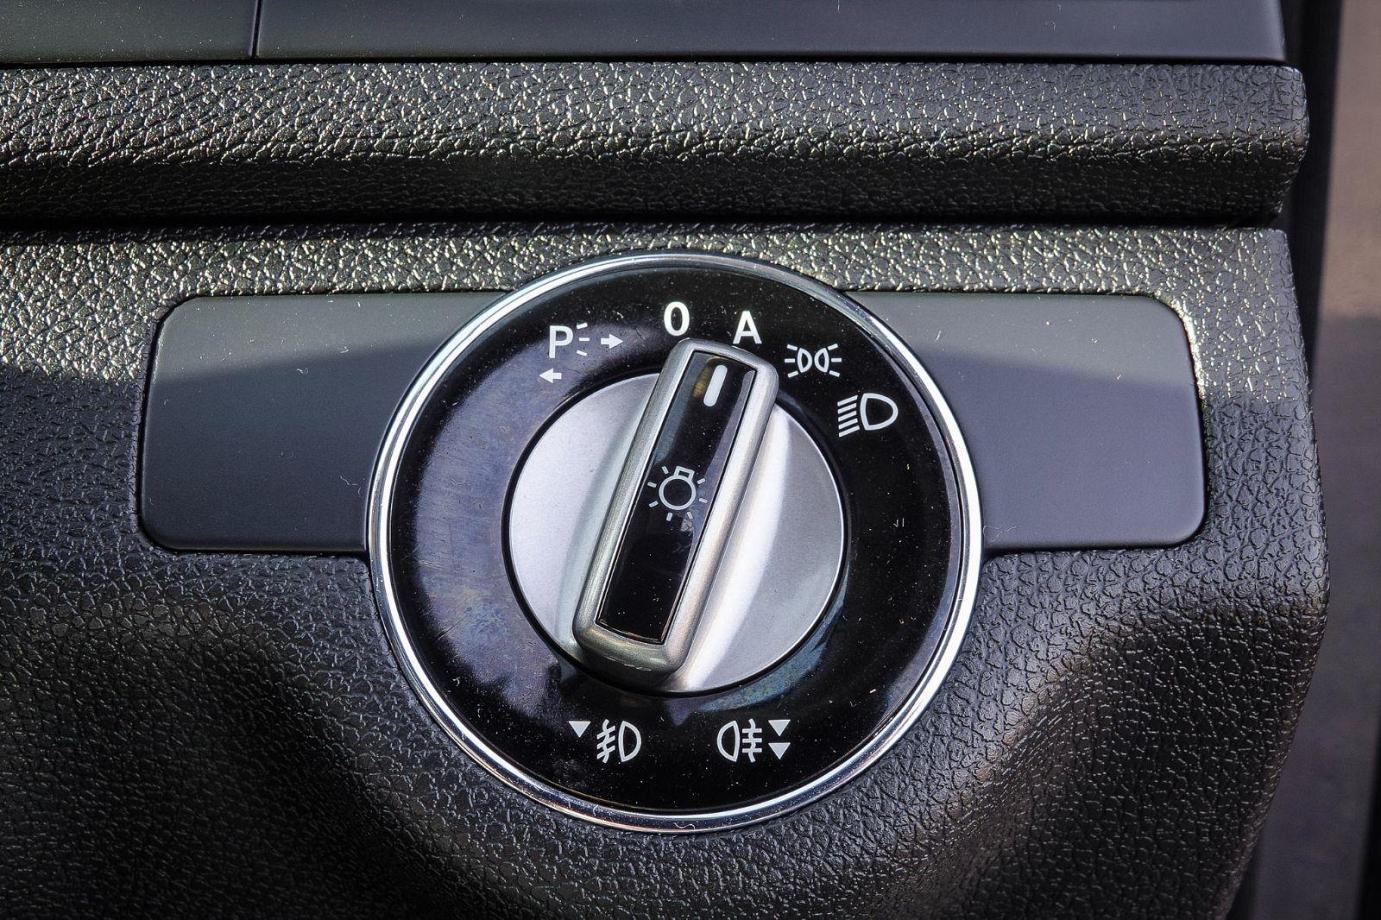 2009 Mercedes-Benz C-Class W204 C220 CDI Classic Sedan 4dr Auto 5sp 2.2DT